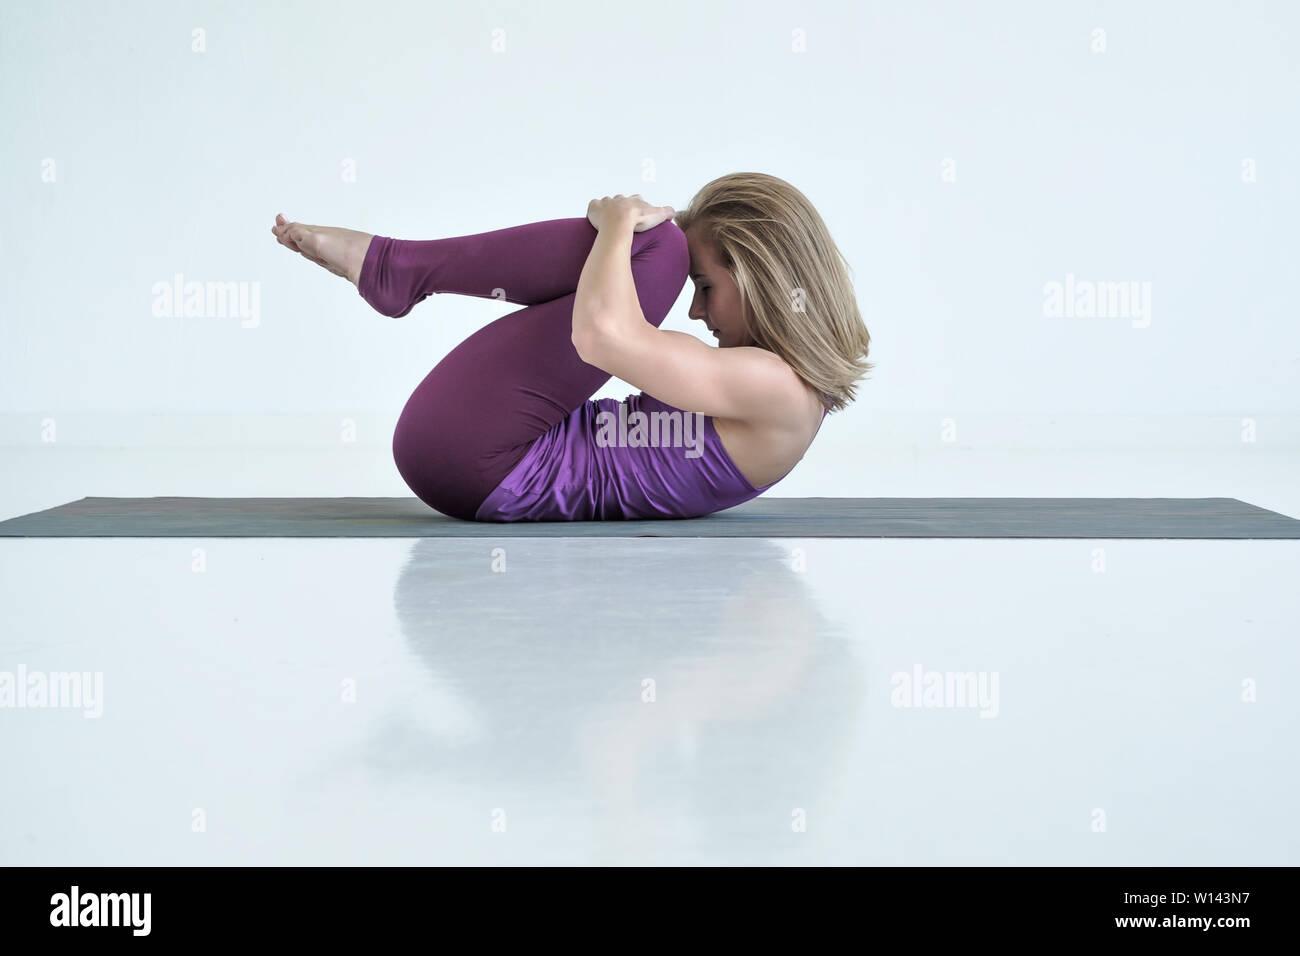 Woman practicing yoga, doing Knees to Chest exercise, Apanasana pose. - Stock Image